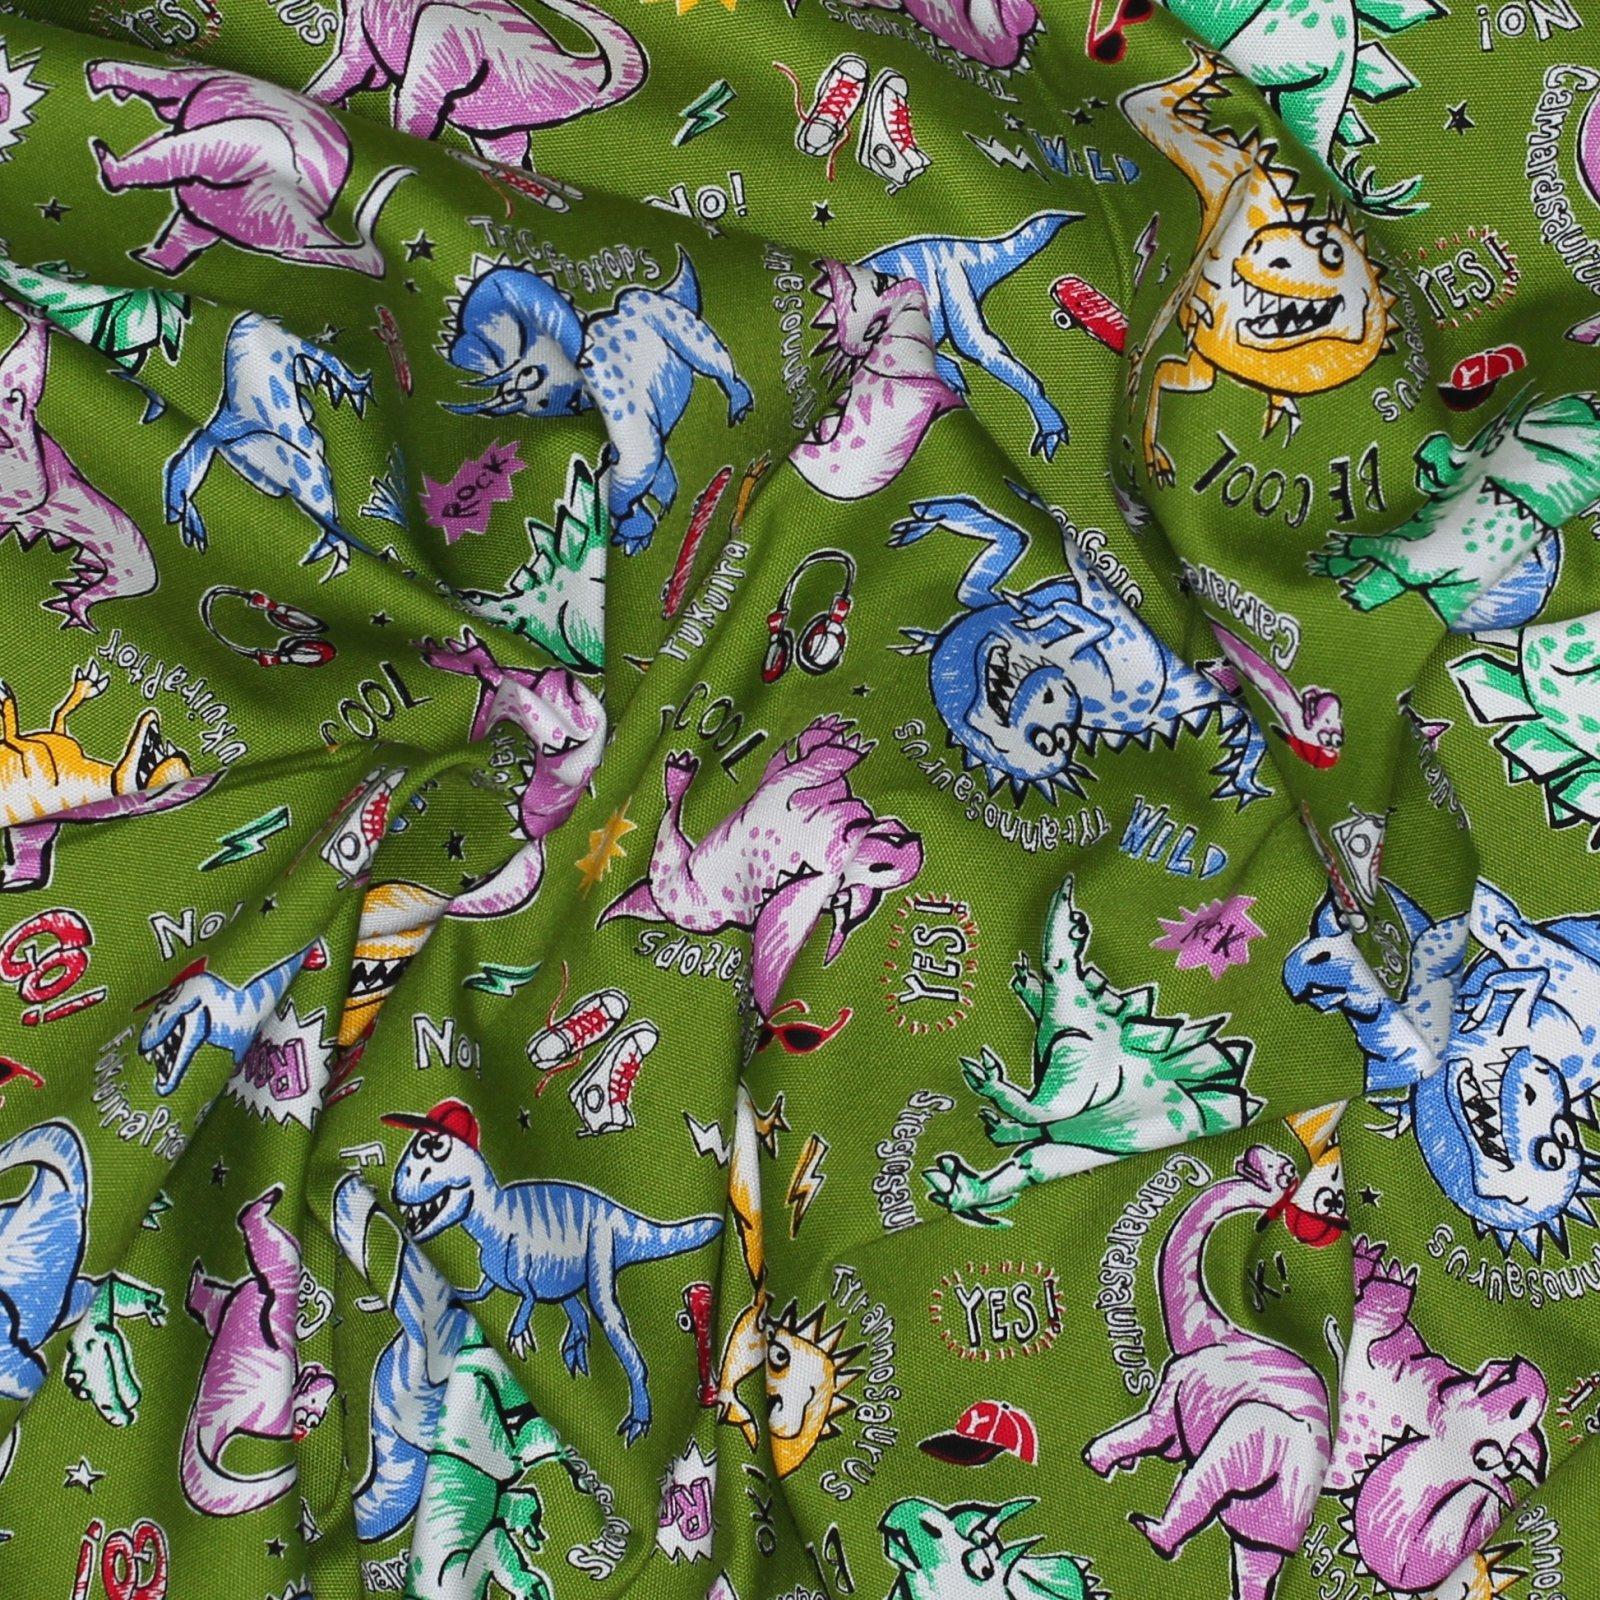 Dinosaurs on Olive - Japanese Cotton